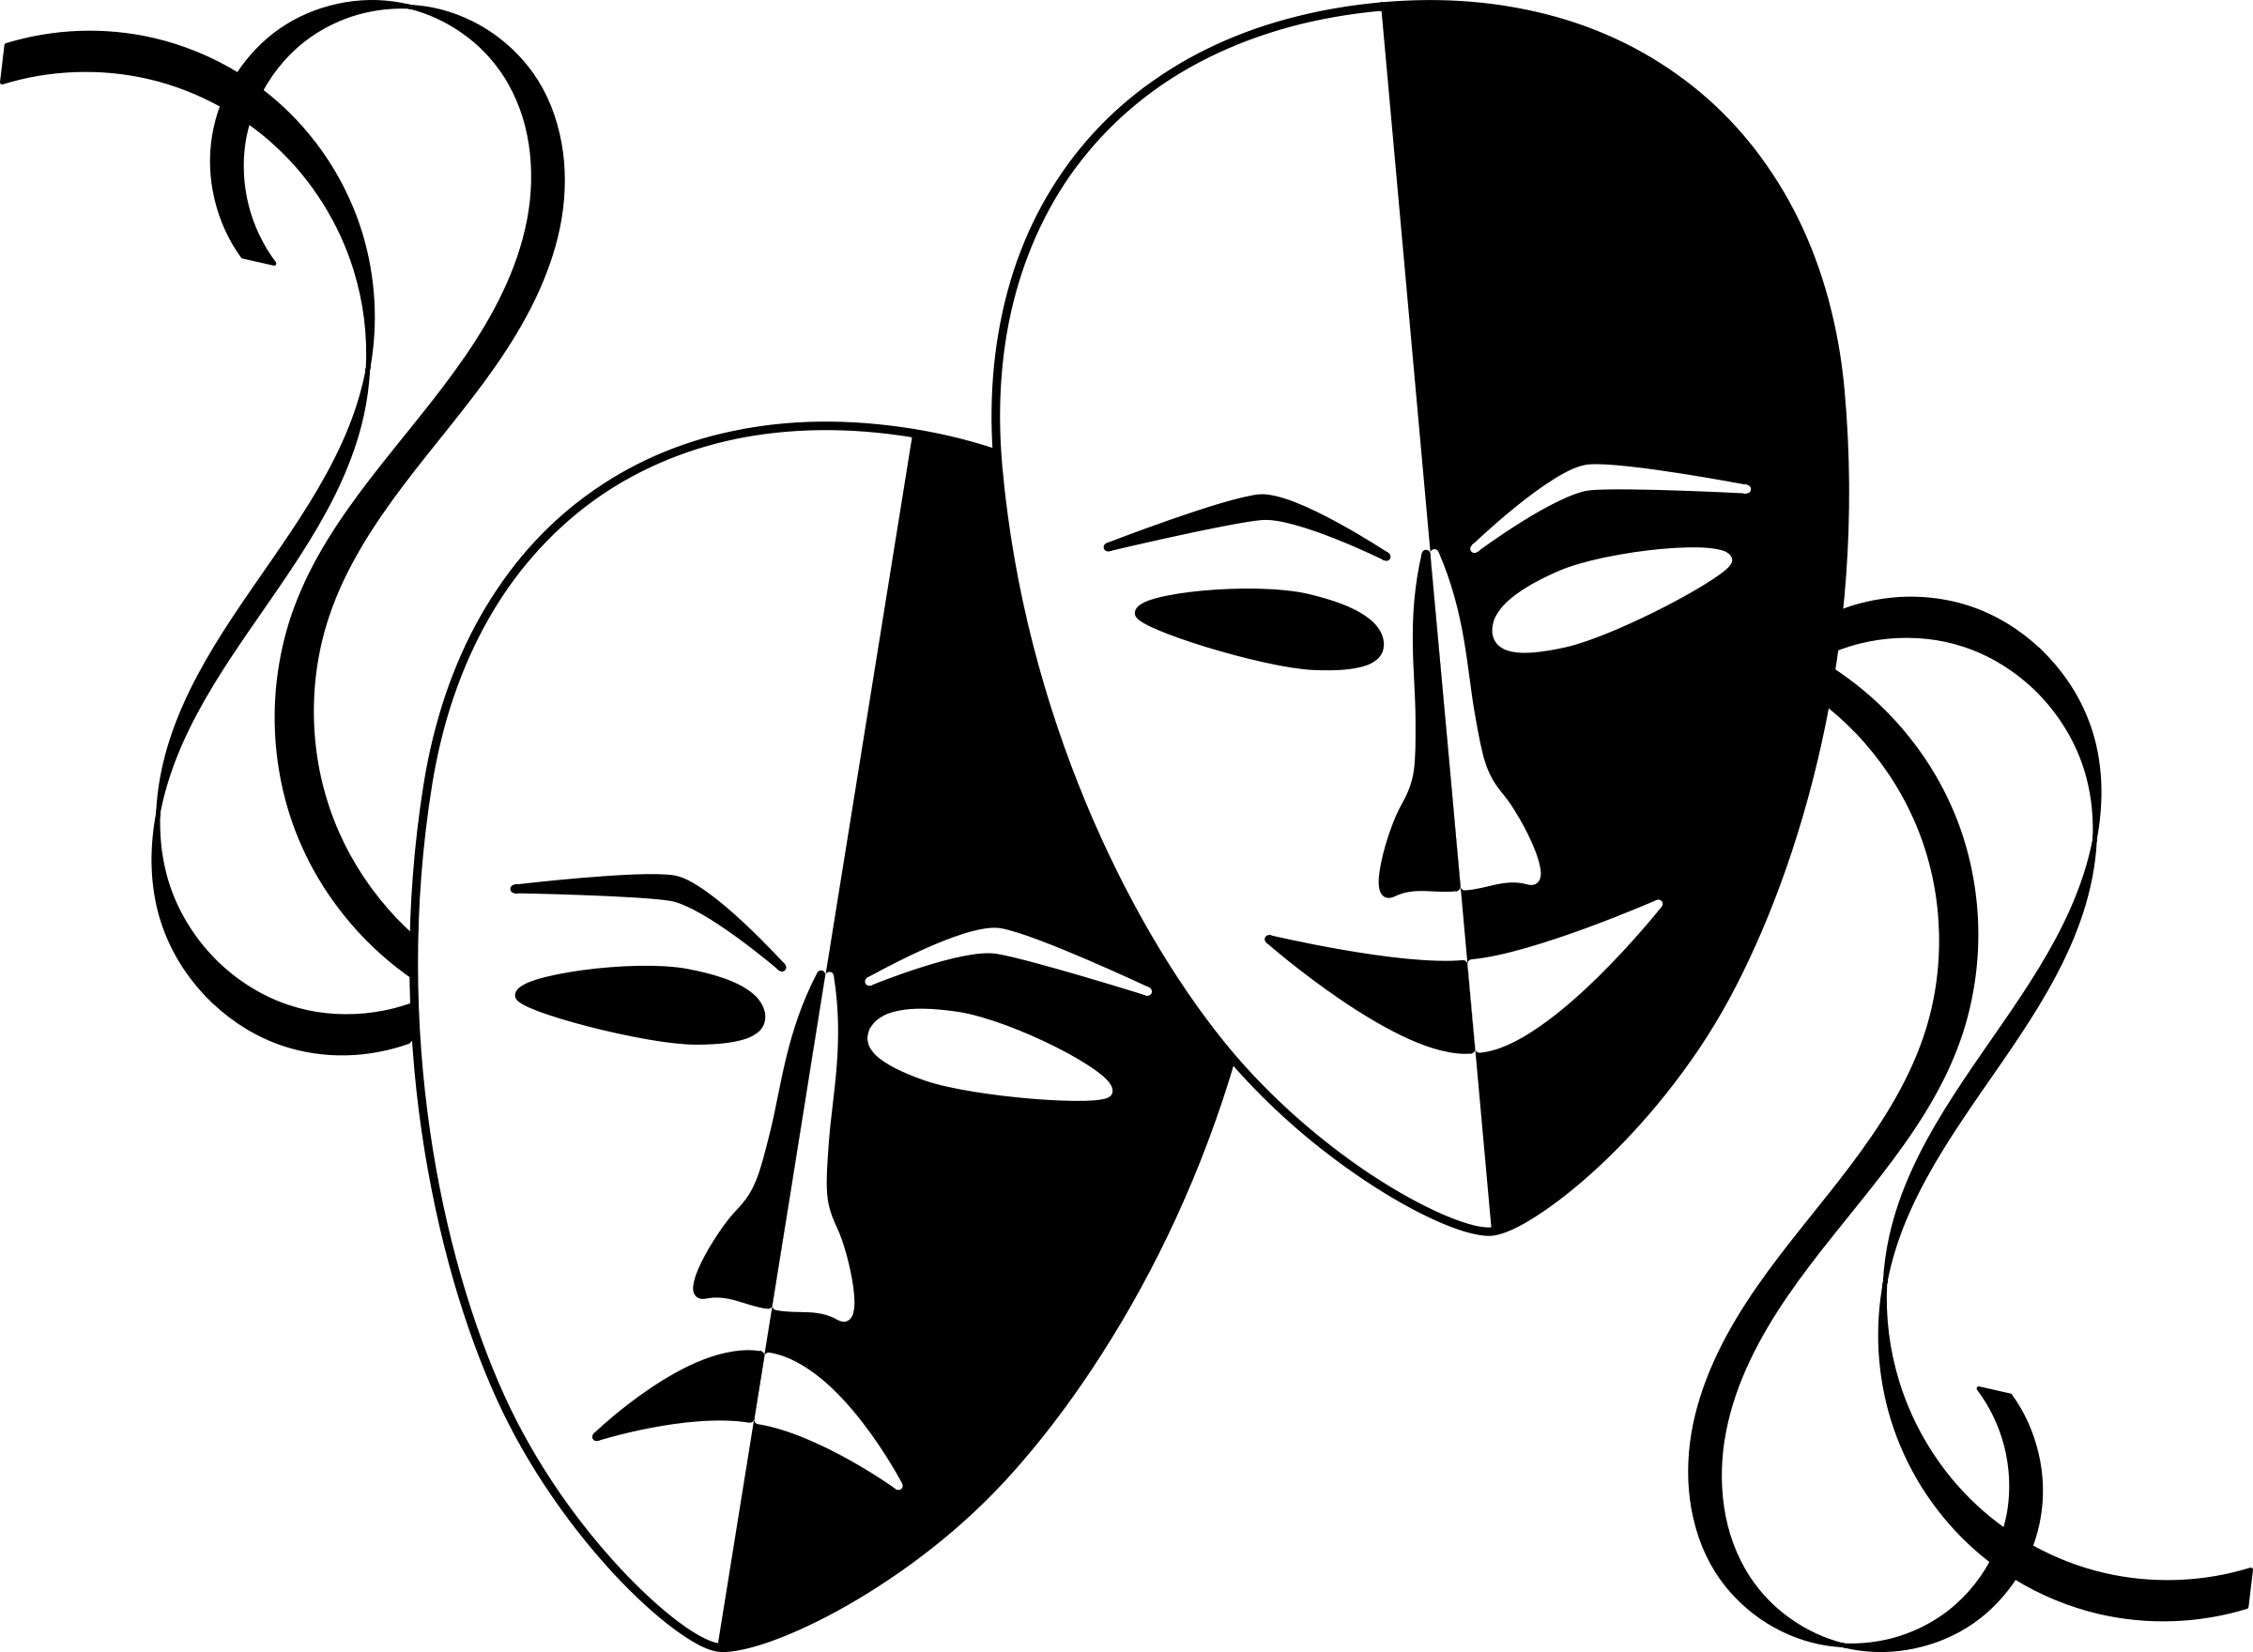 Wasat Theatre Masks Png 2 400 1 760 Pixeles Imagenes De Teatro Arte Dramatico Mascaras Teatro